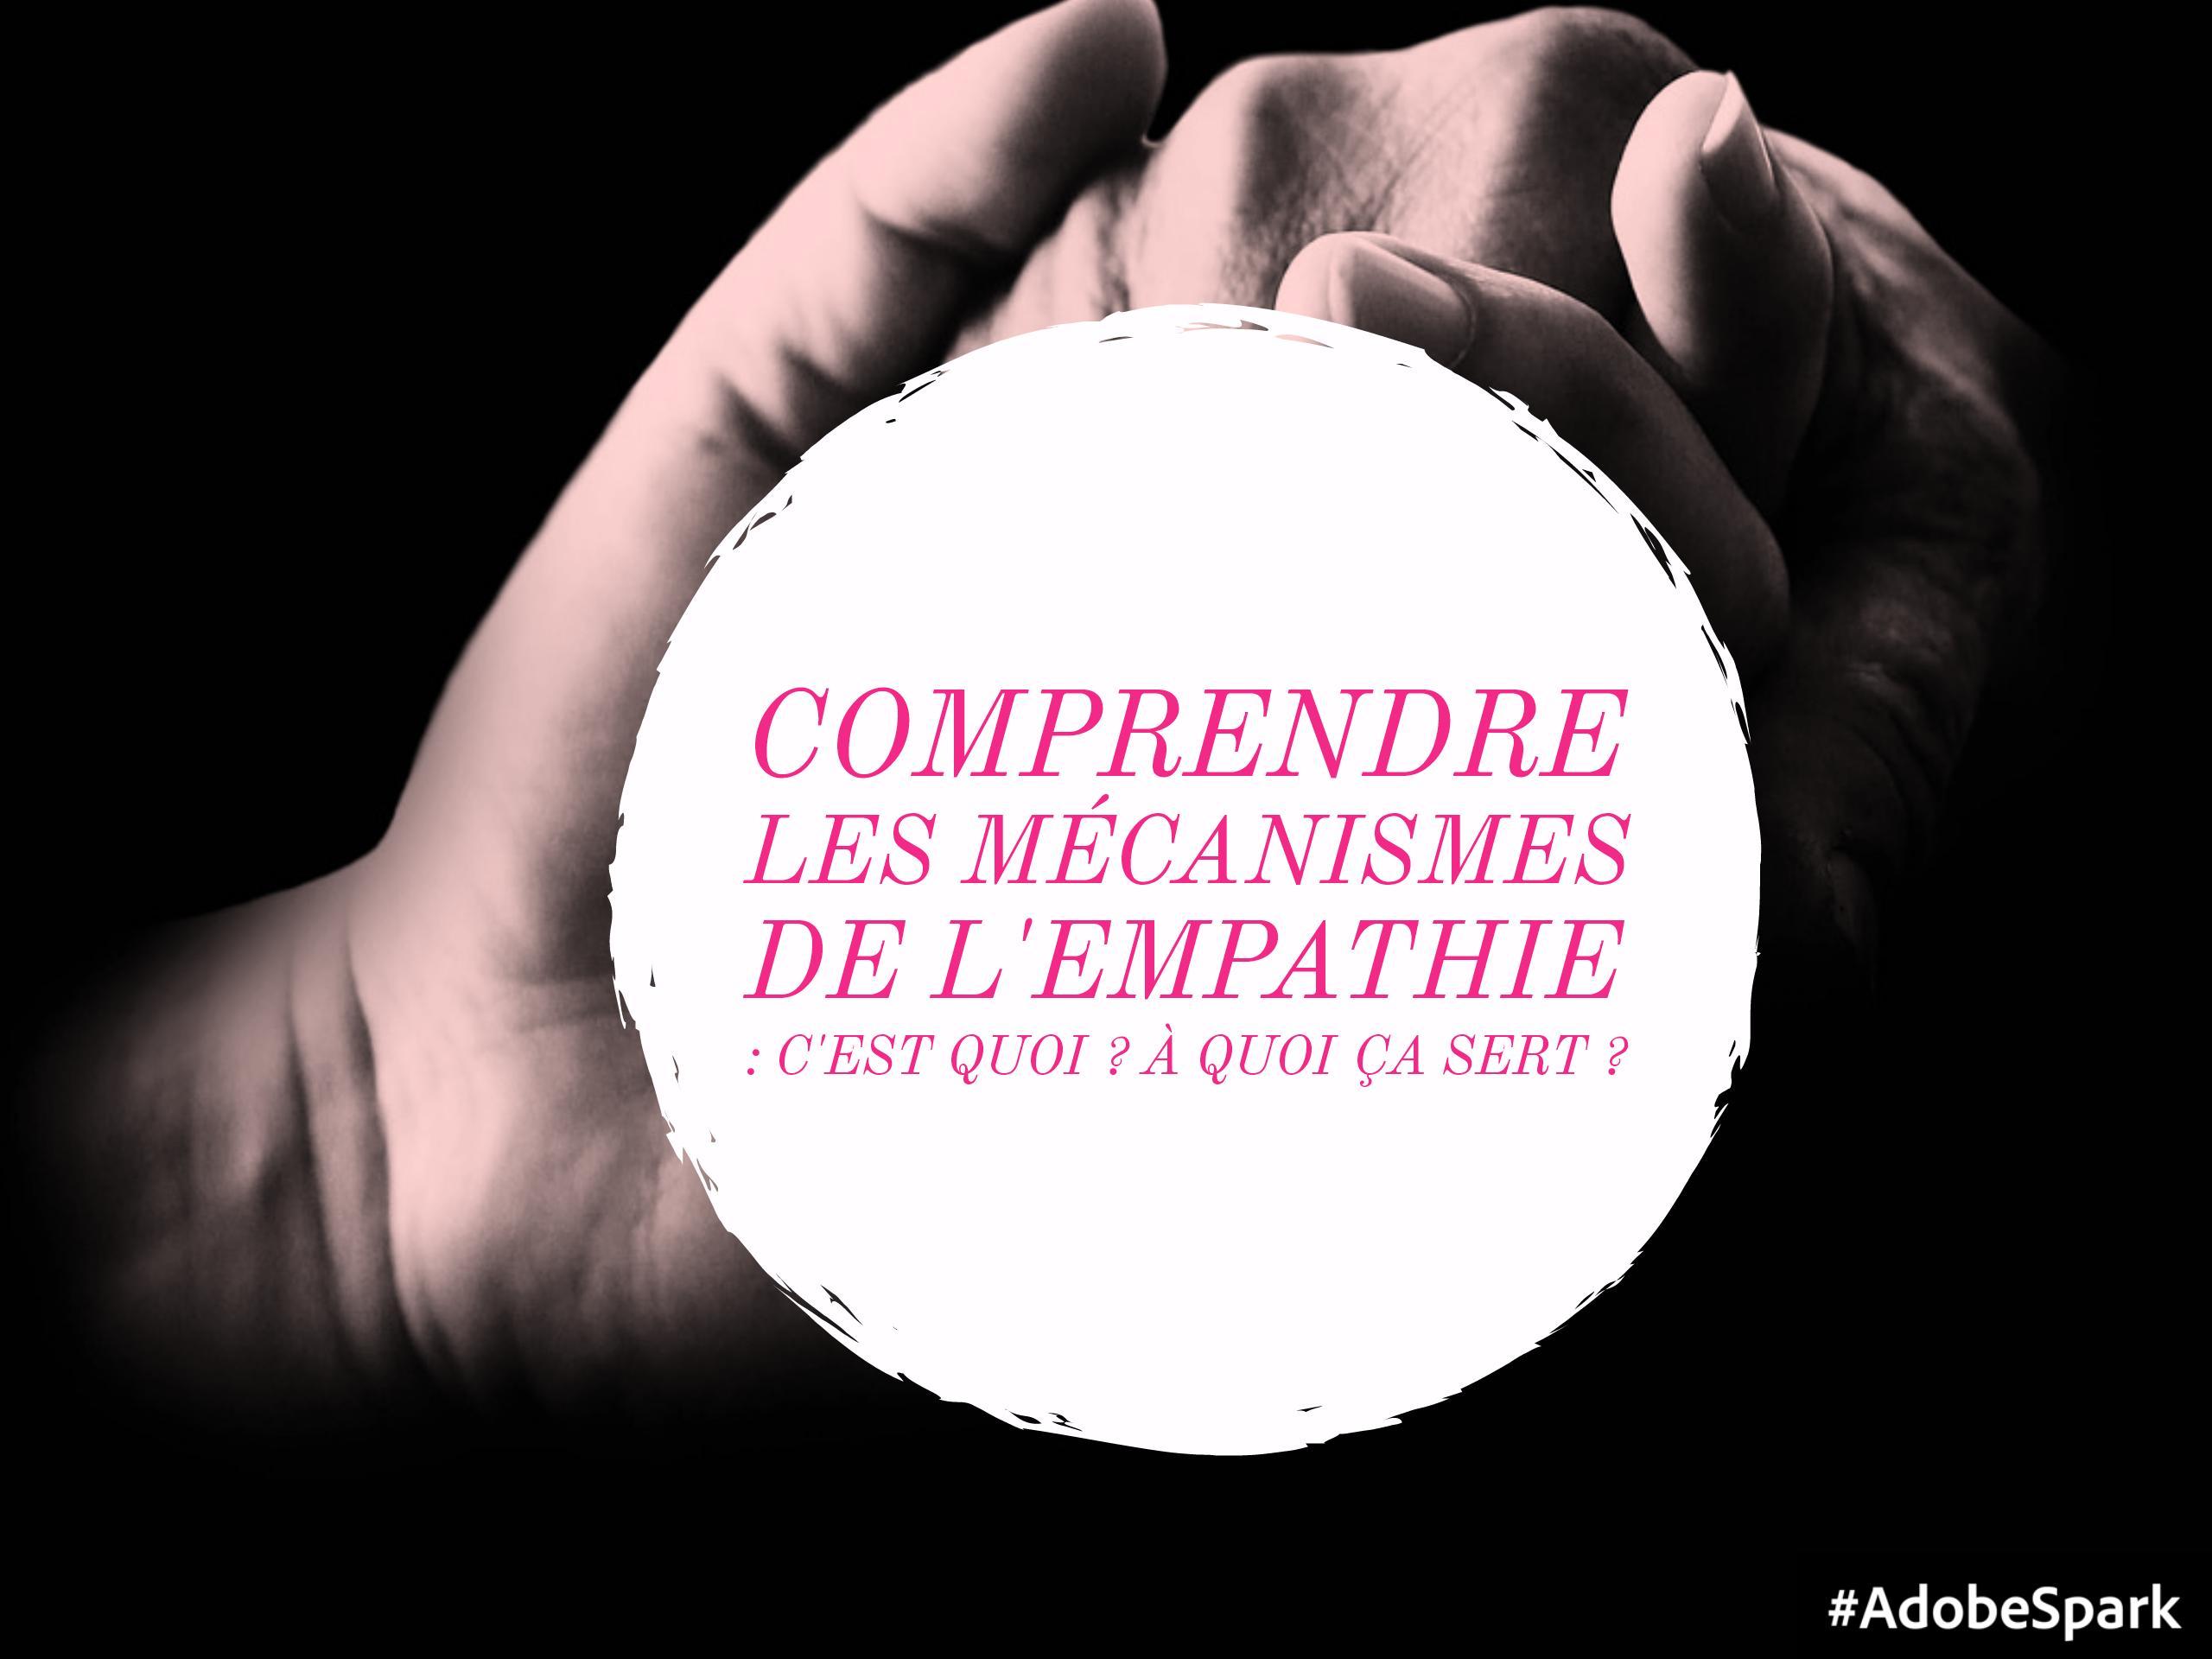 empathie à quoi ça sert